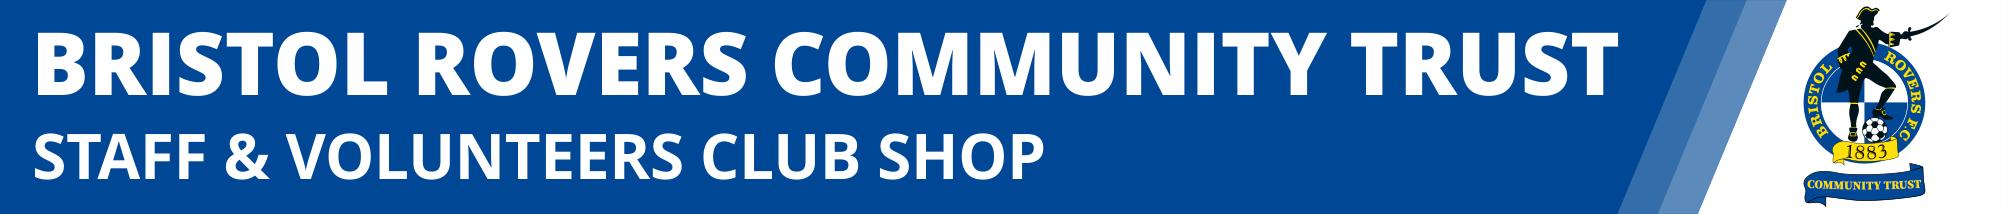 bristol-rovers-community-trust-staff-volunteers-club-shop-banner.png